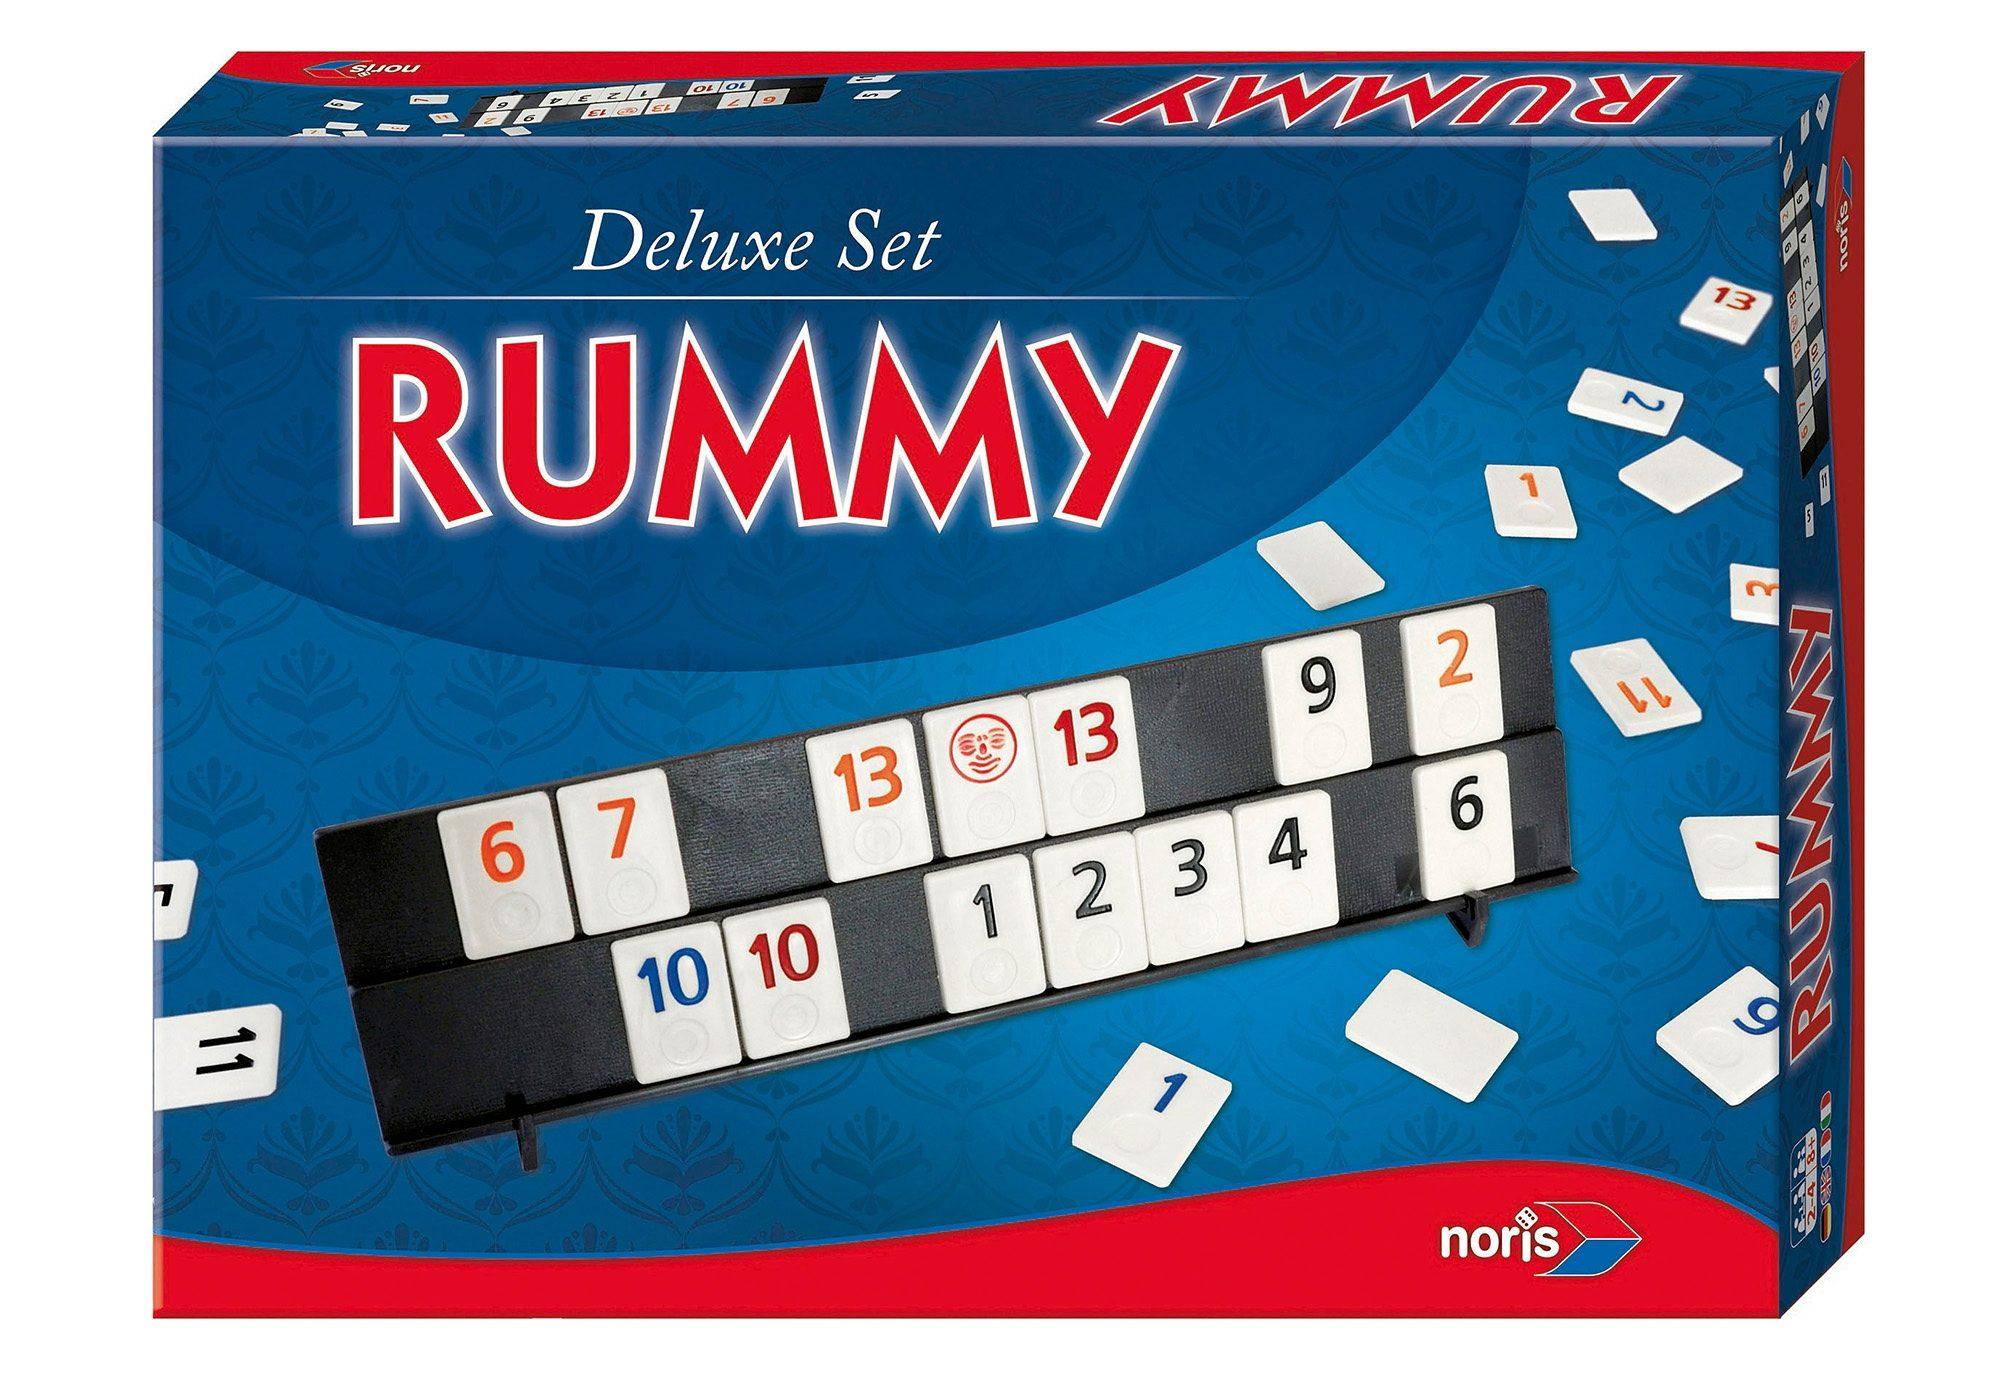 Noris, Deluxe-Set Rummy Preisvergleich